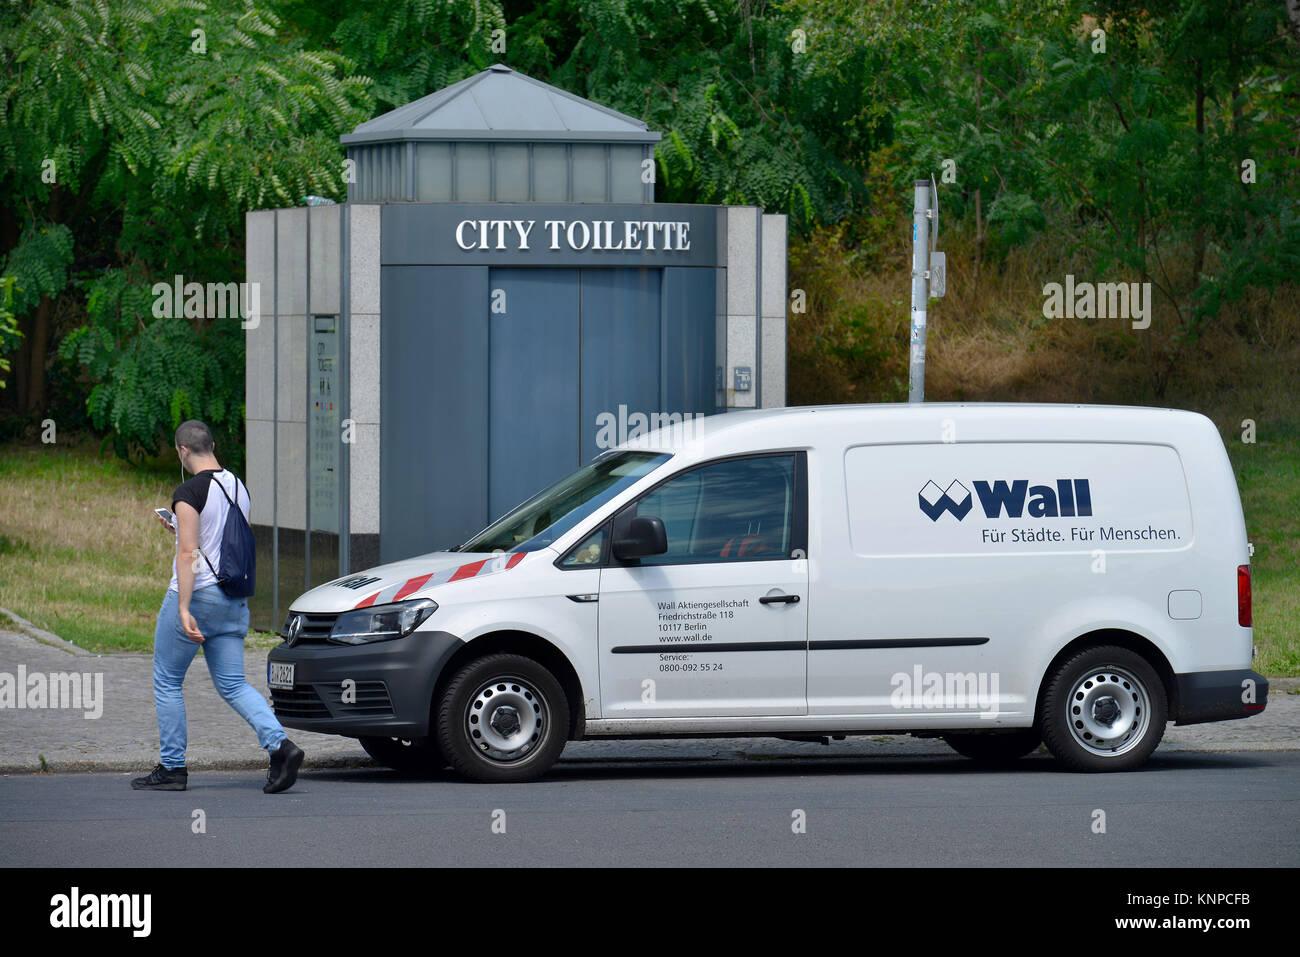 City toilet, city hall, Hanna-Renate-Laurien-Platz, Leonorenstrasse, Lankwitz, Steglitz-Zehlendorf, Berlin, Germany, Stock Photo